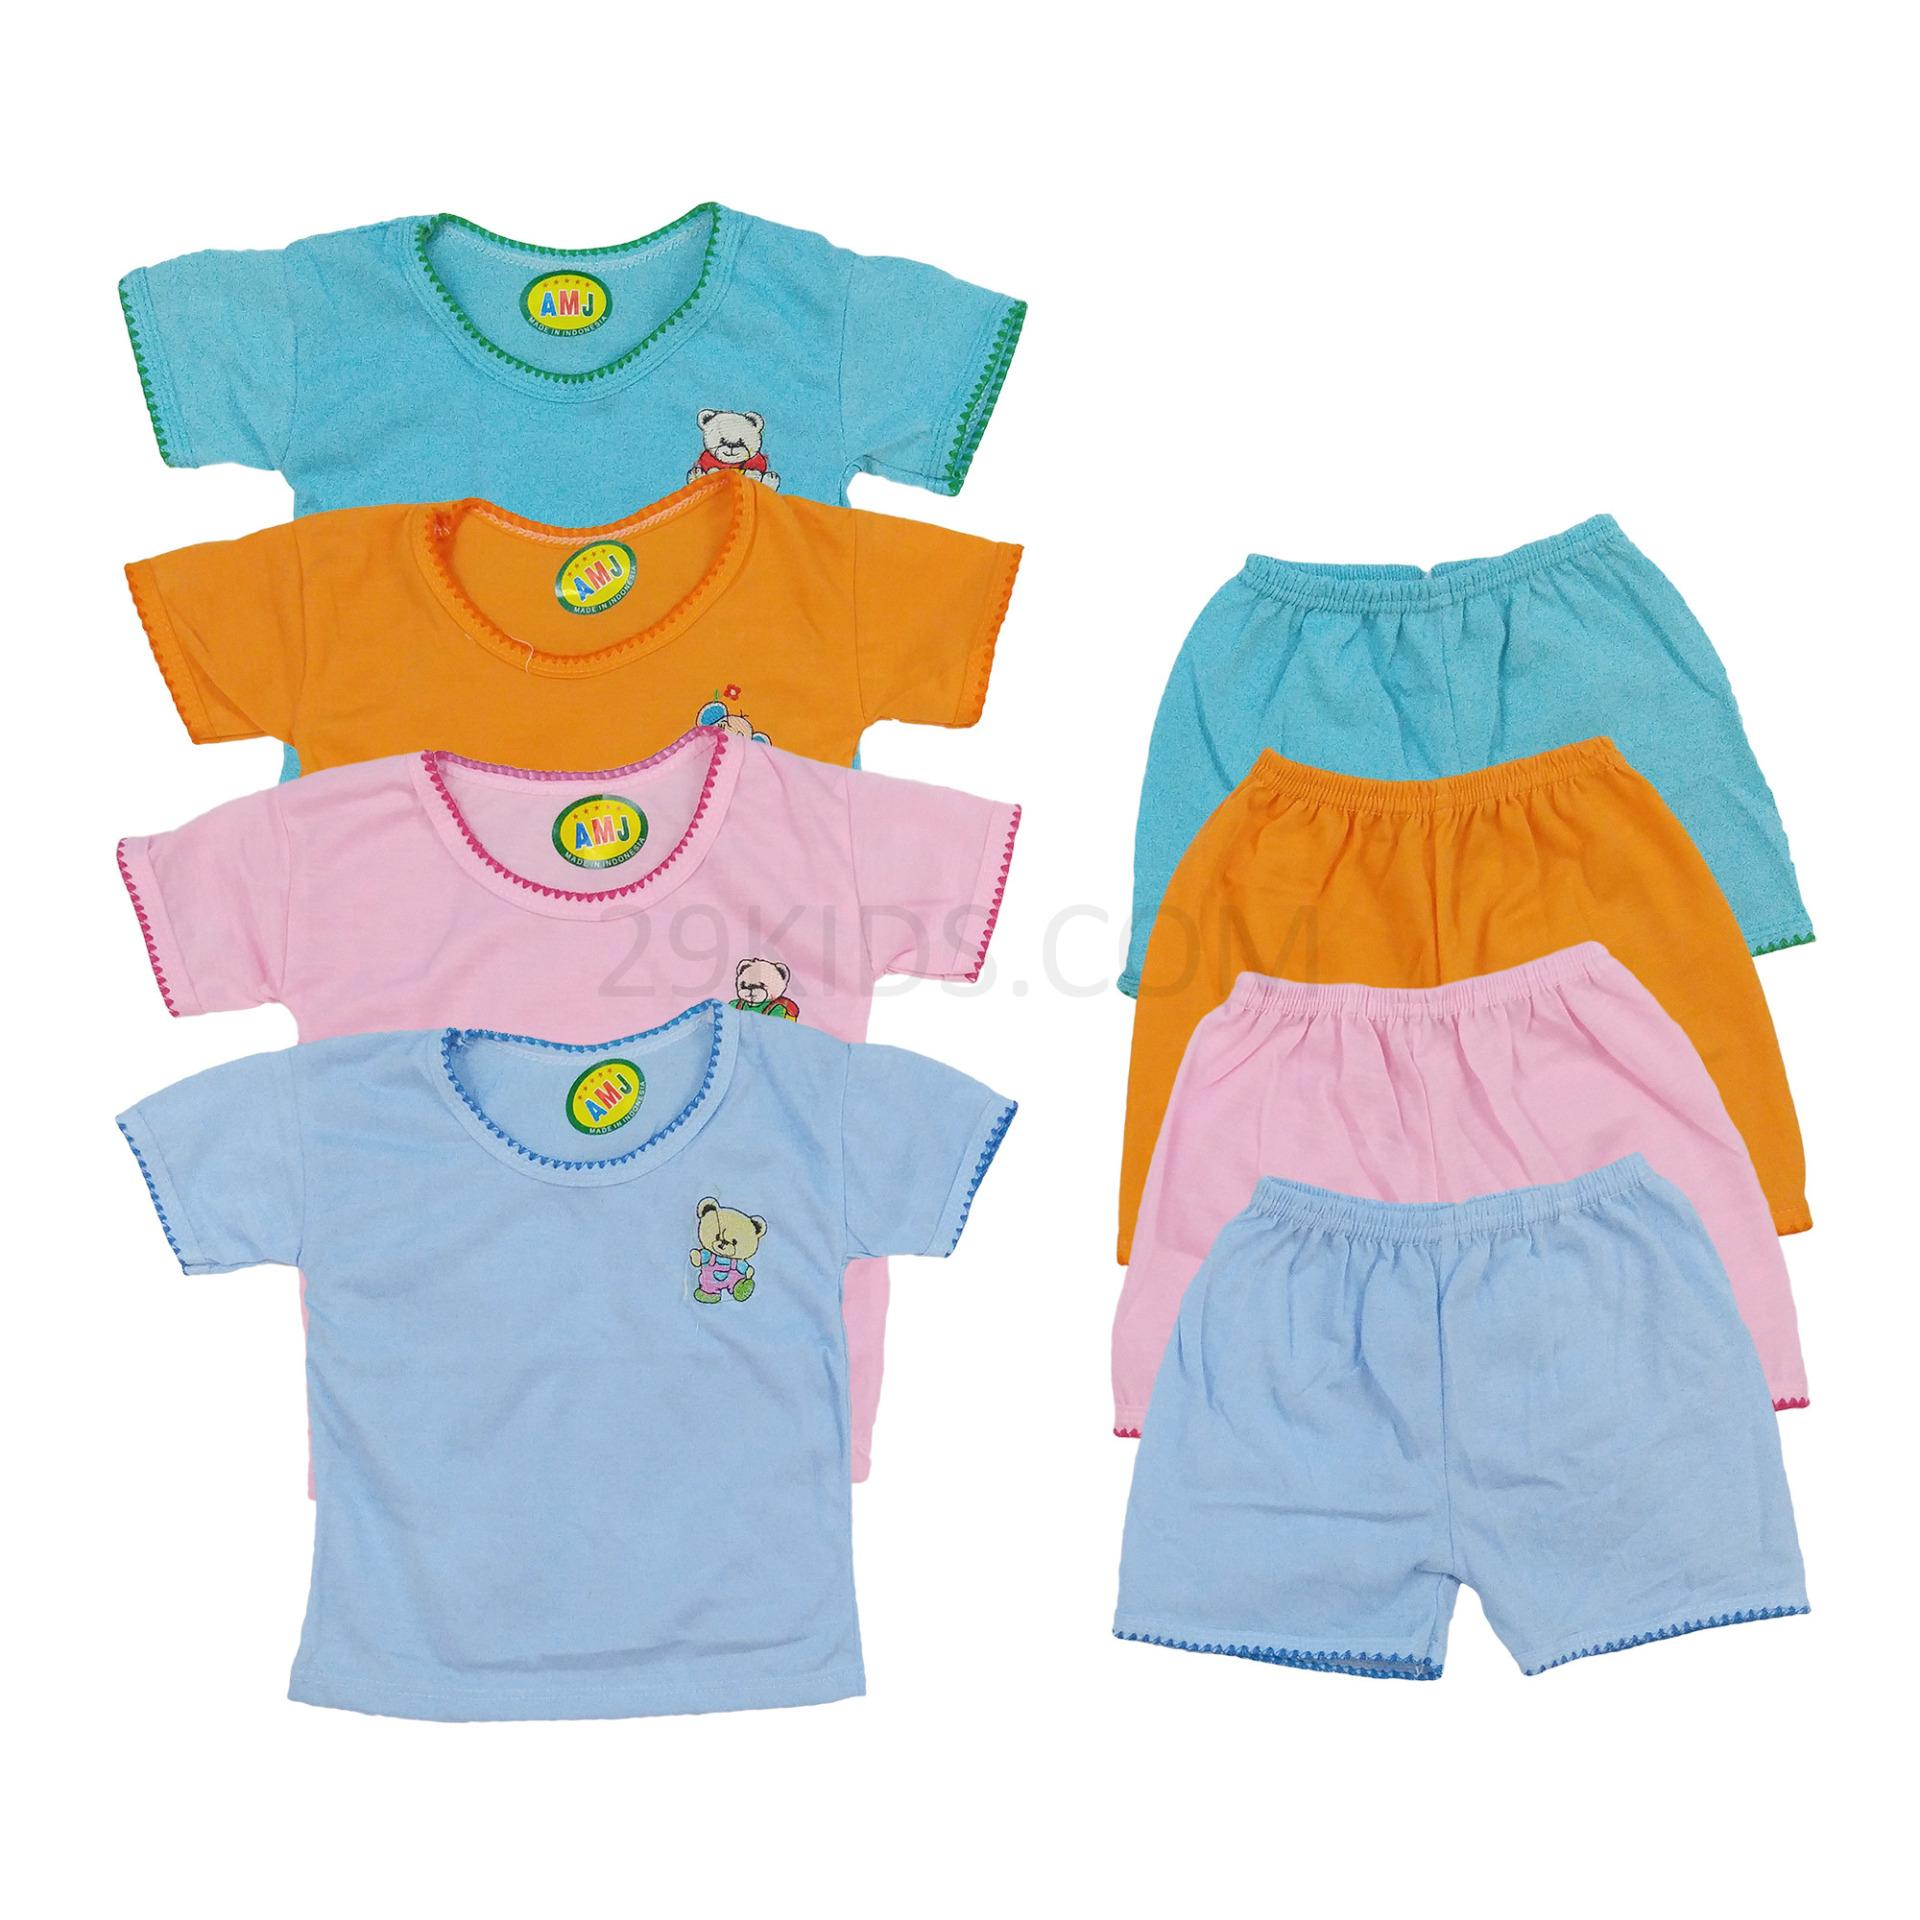 3 Pcs - Setelan Kaos Lengan Pendek Bayi Murah